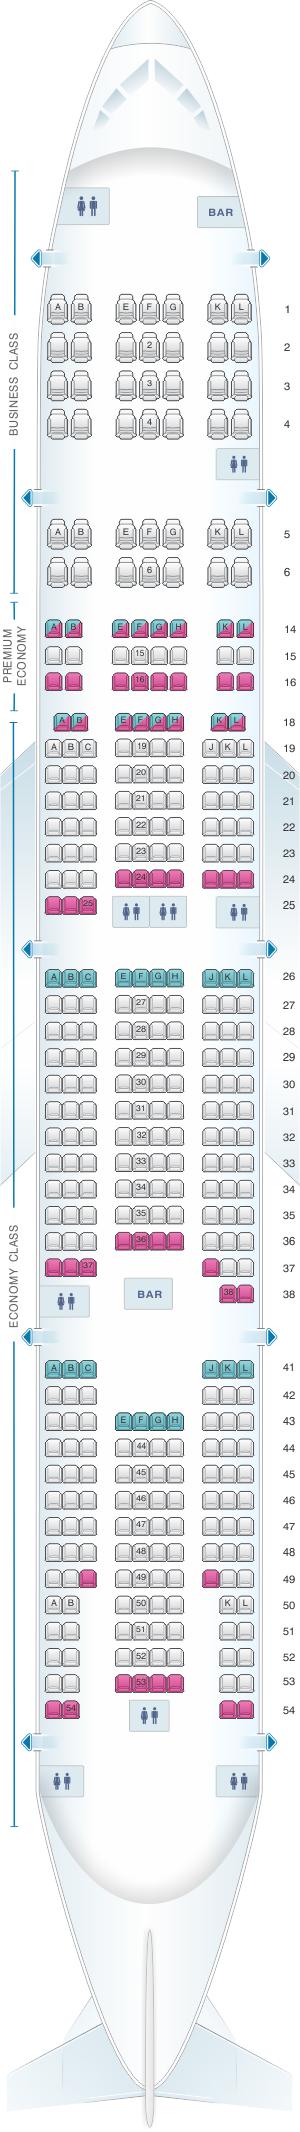 Plan de cabine air france boeing b777 300 long haul for Plan cabine 777 300er